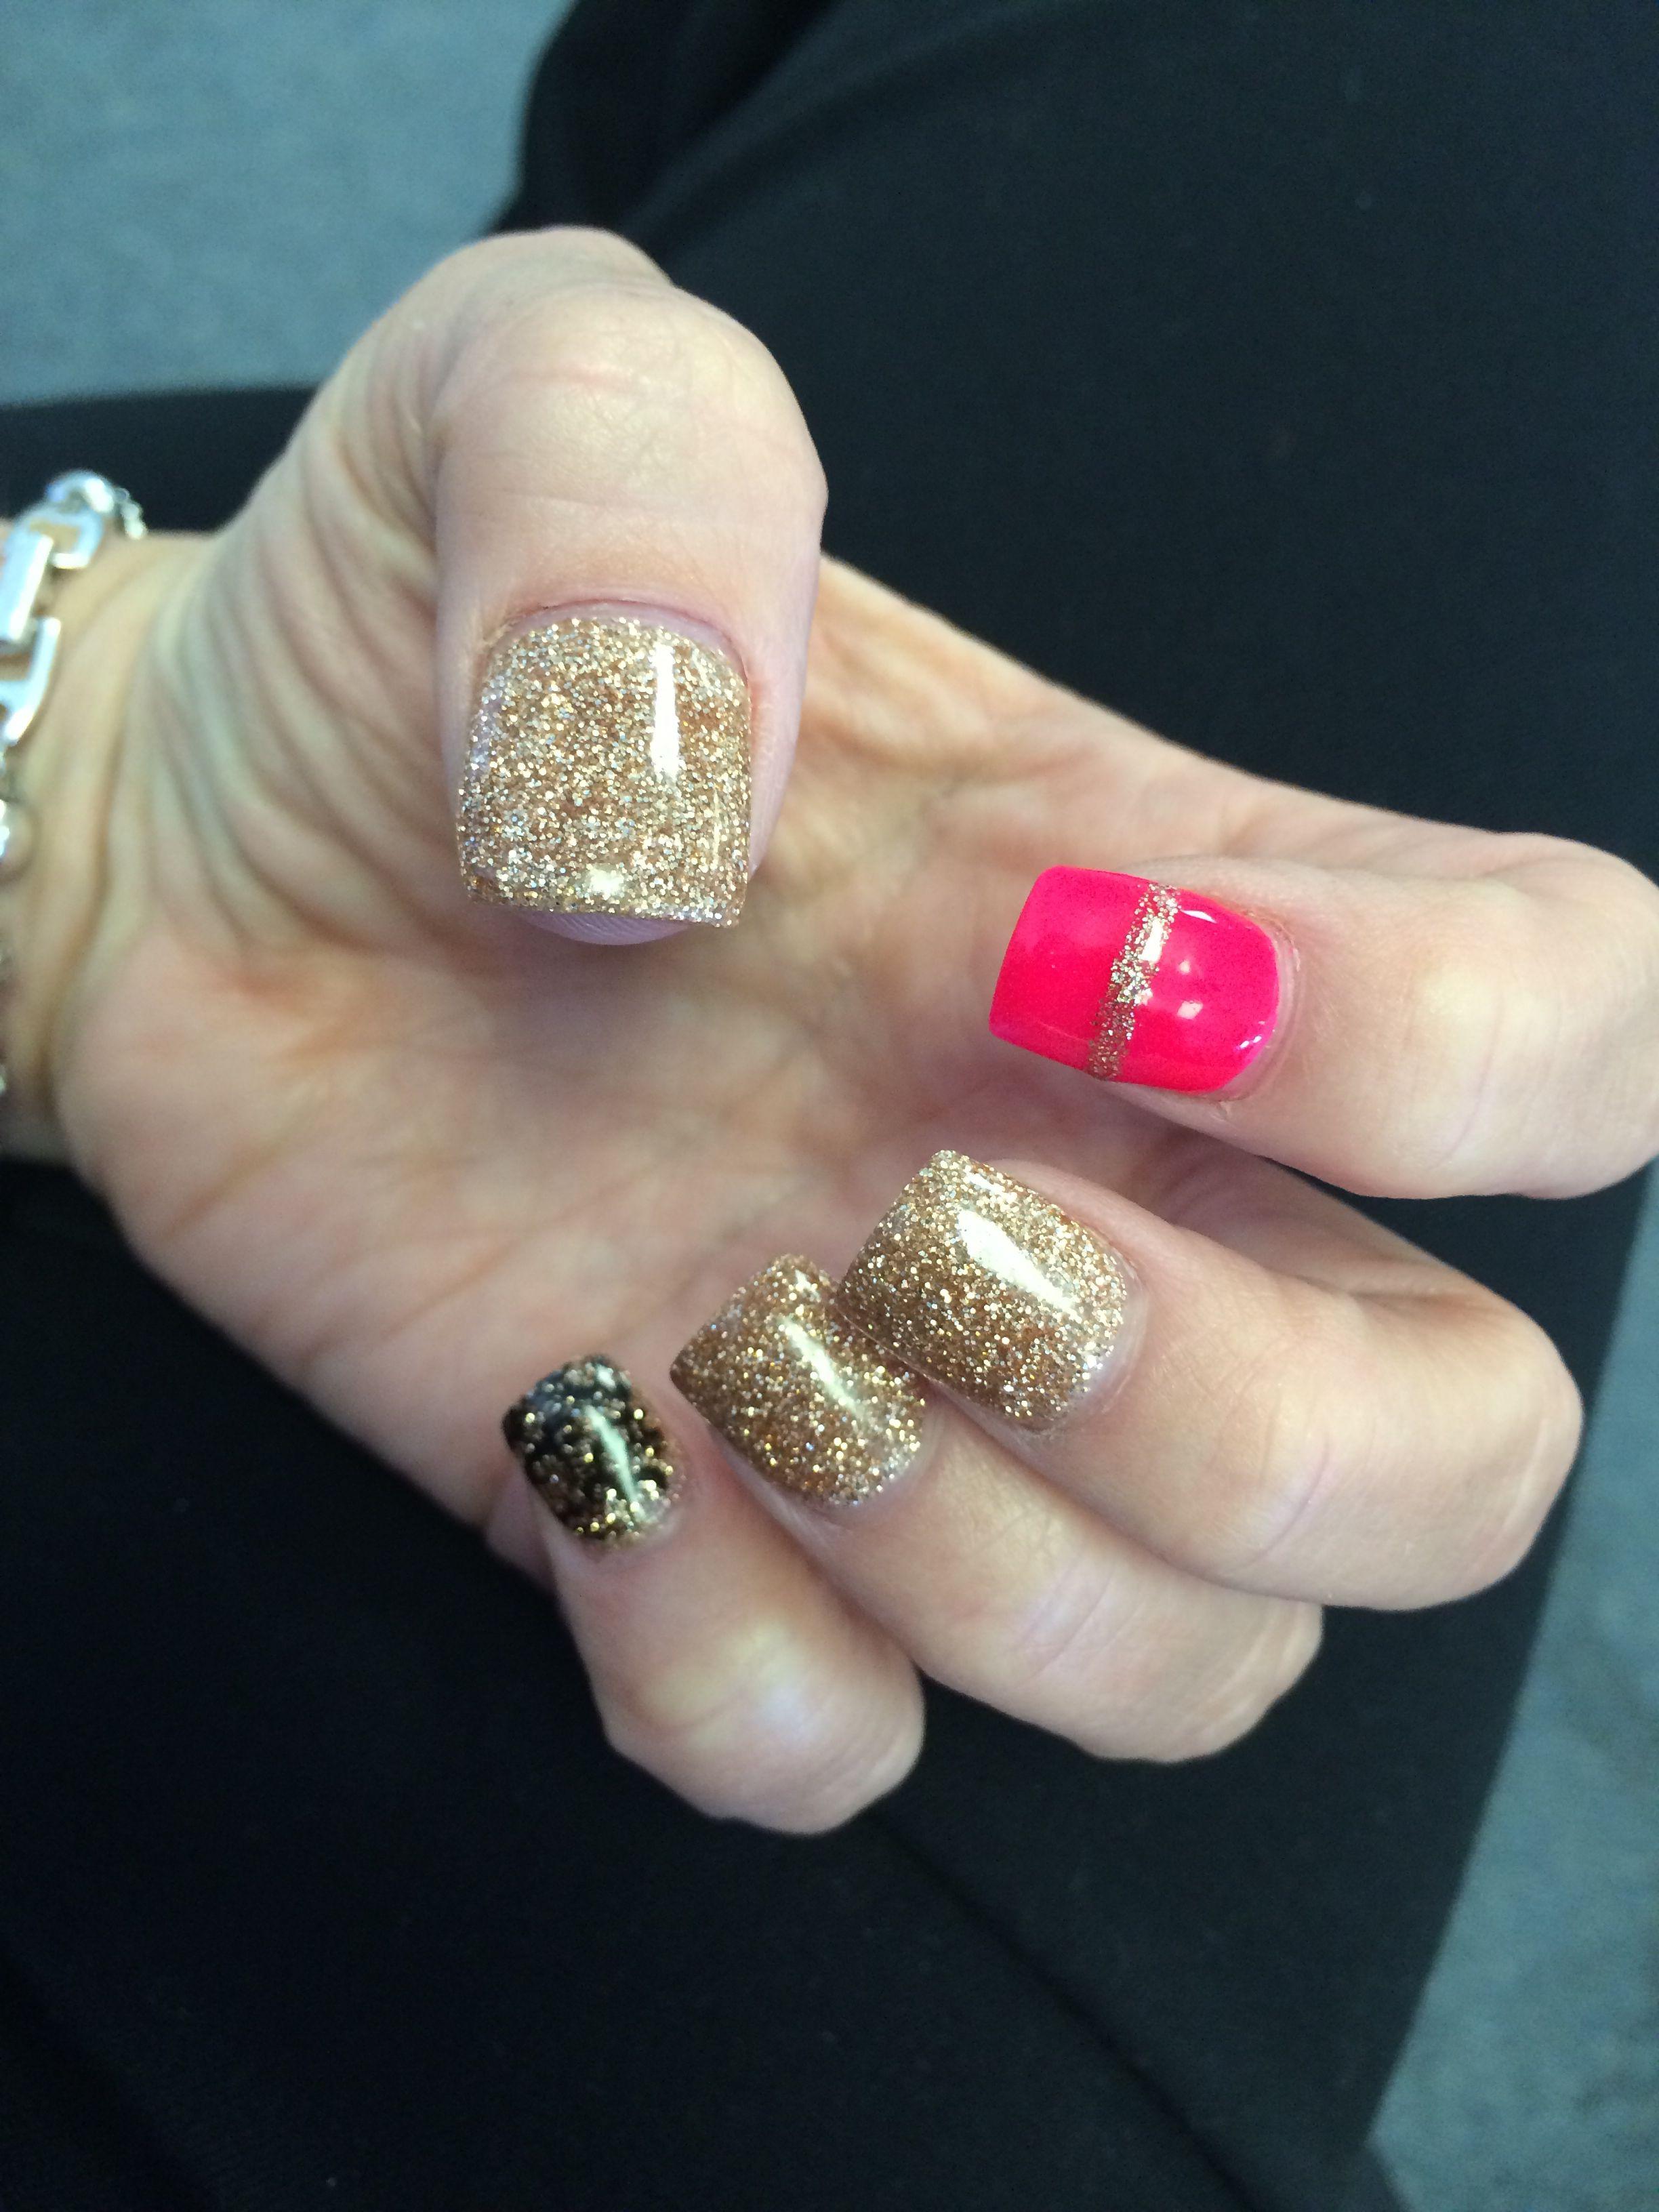 Love Jamberry nails